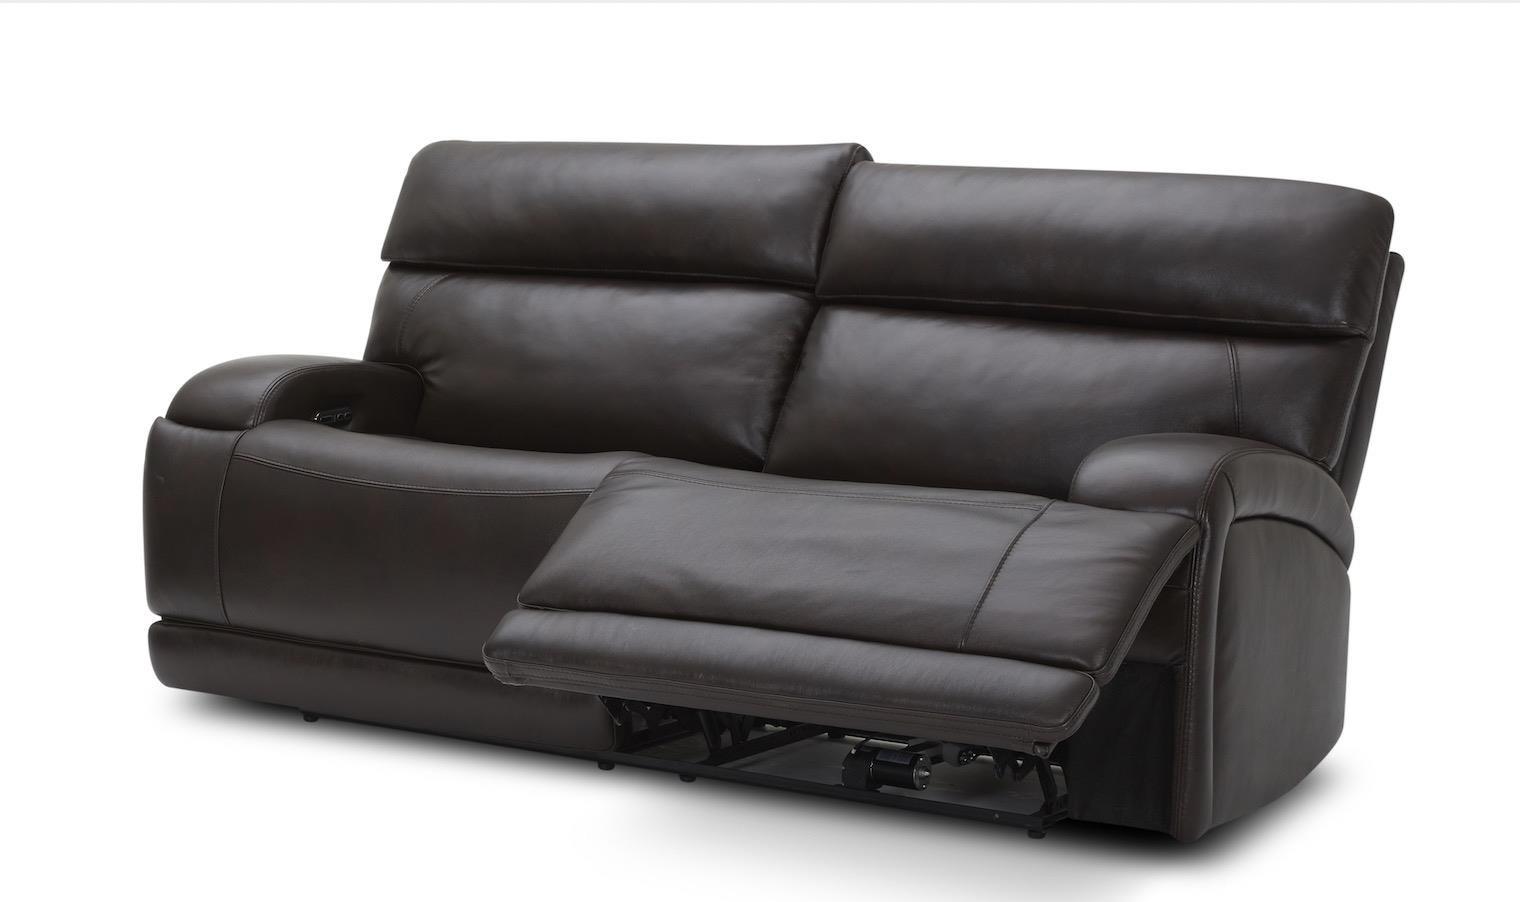 TRIPLE Power Reclining Leather Sofa